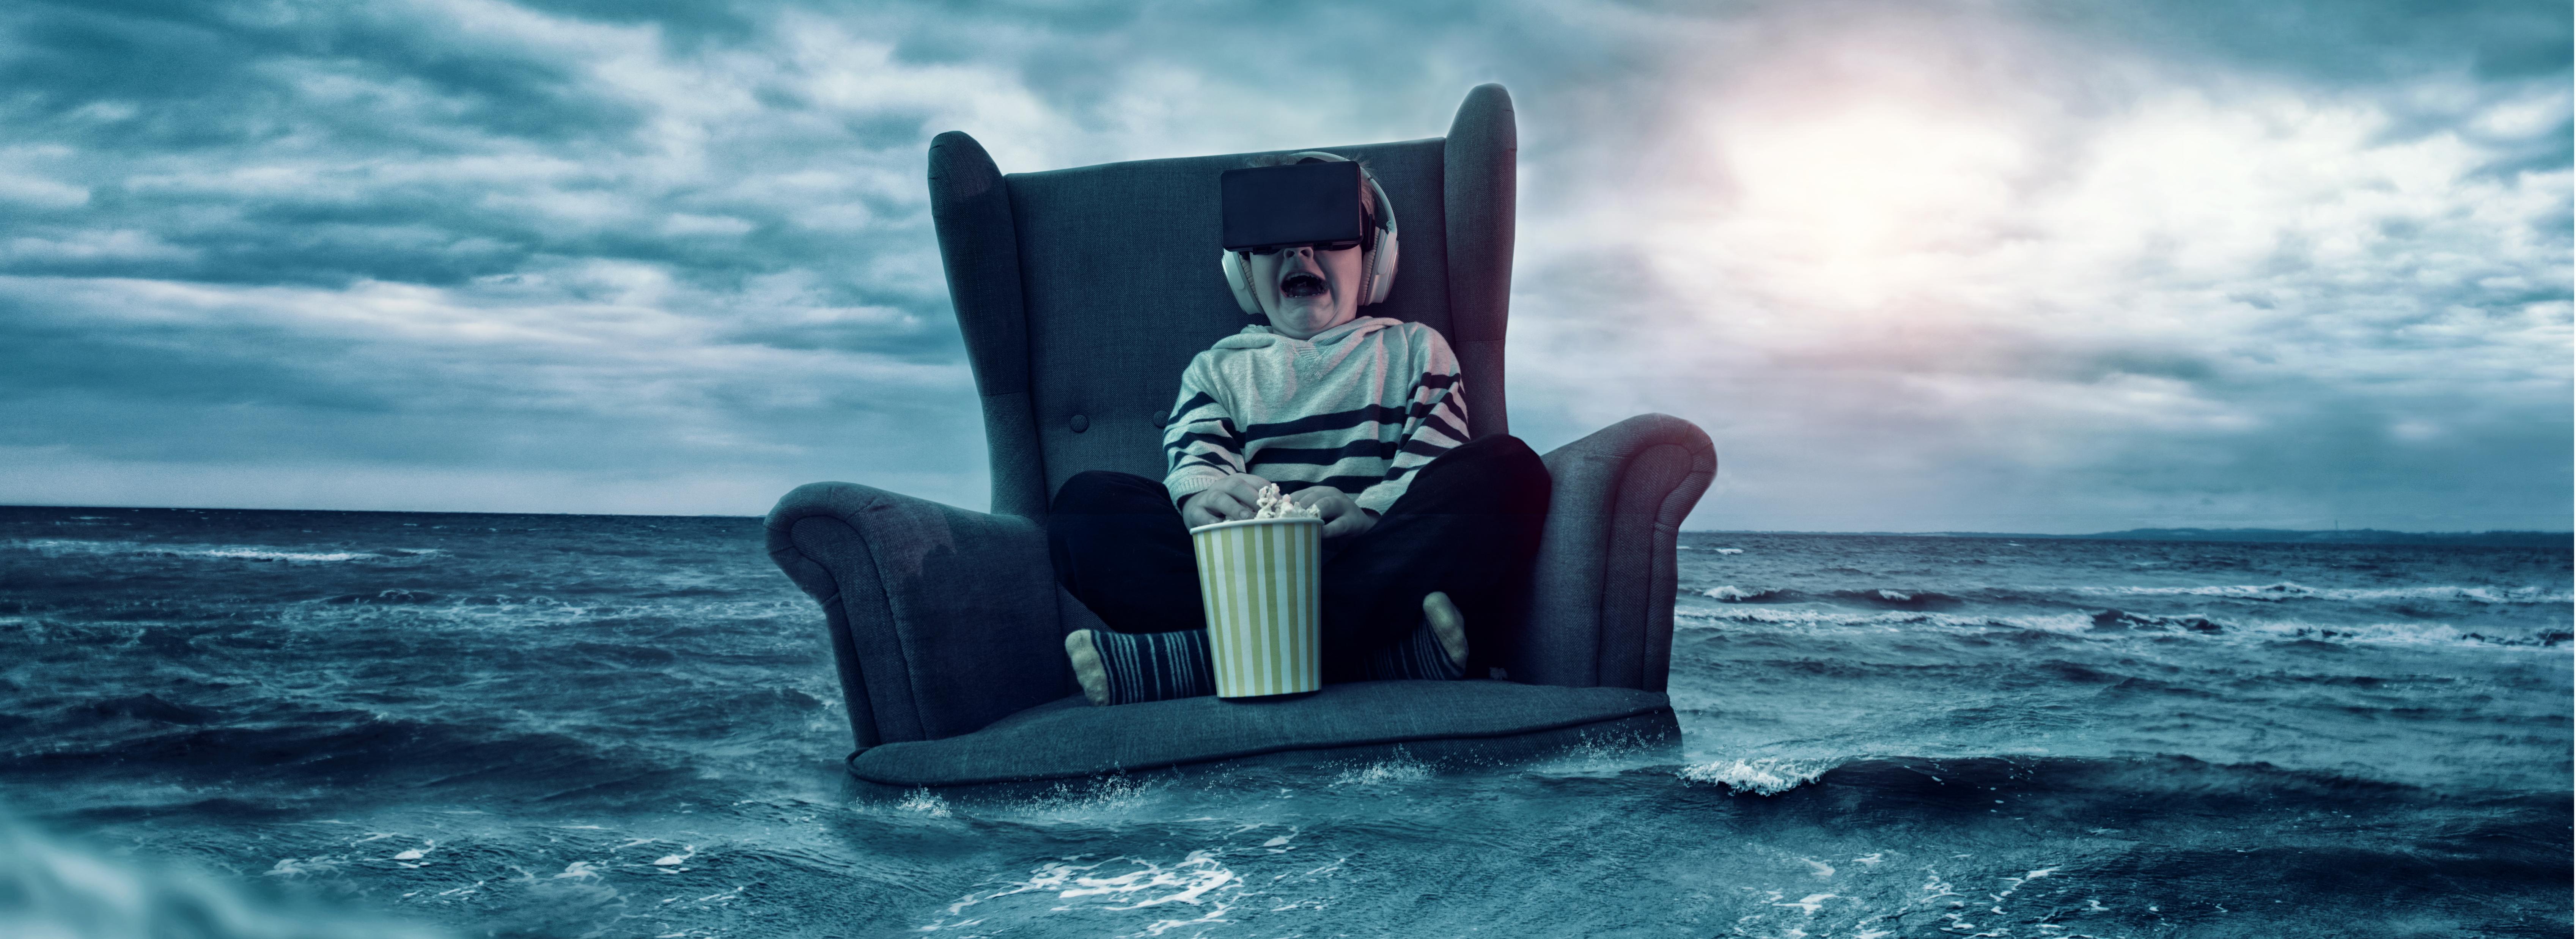 Streaming VR virtual reality